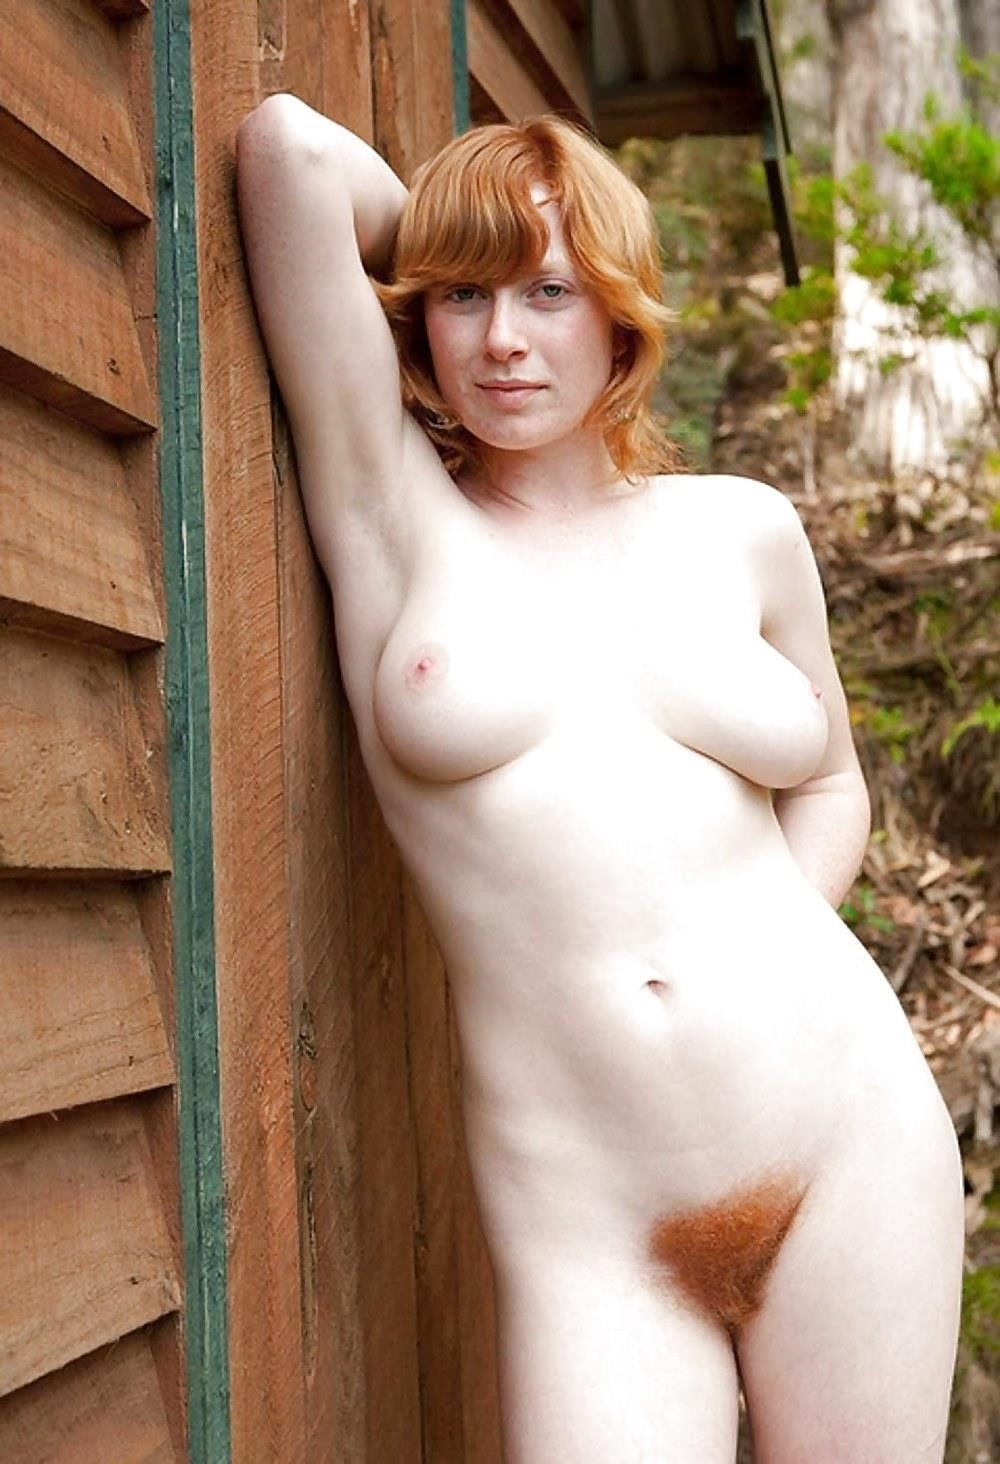 Nude hairy redhead pics-1280